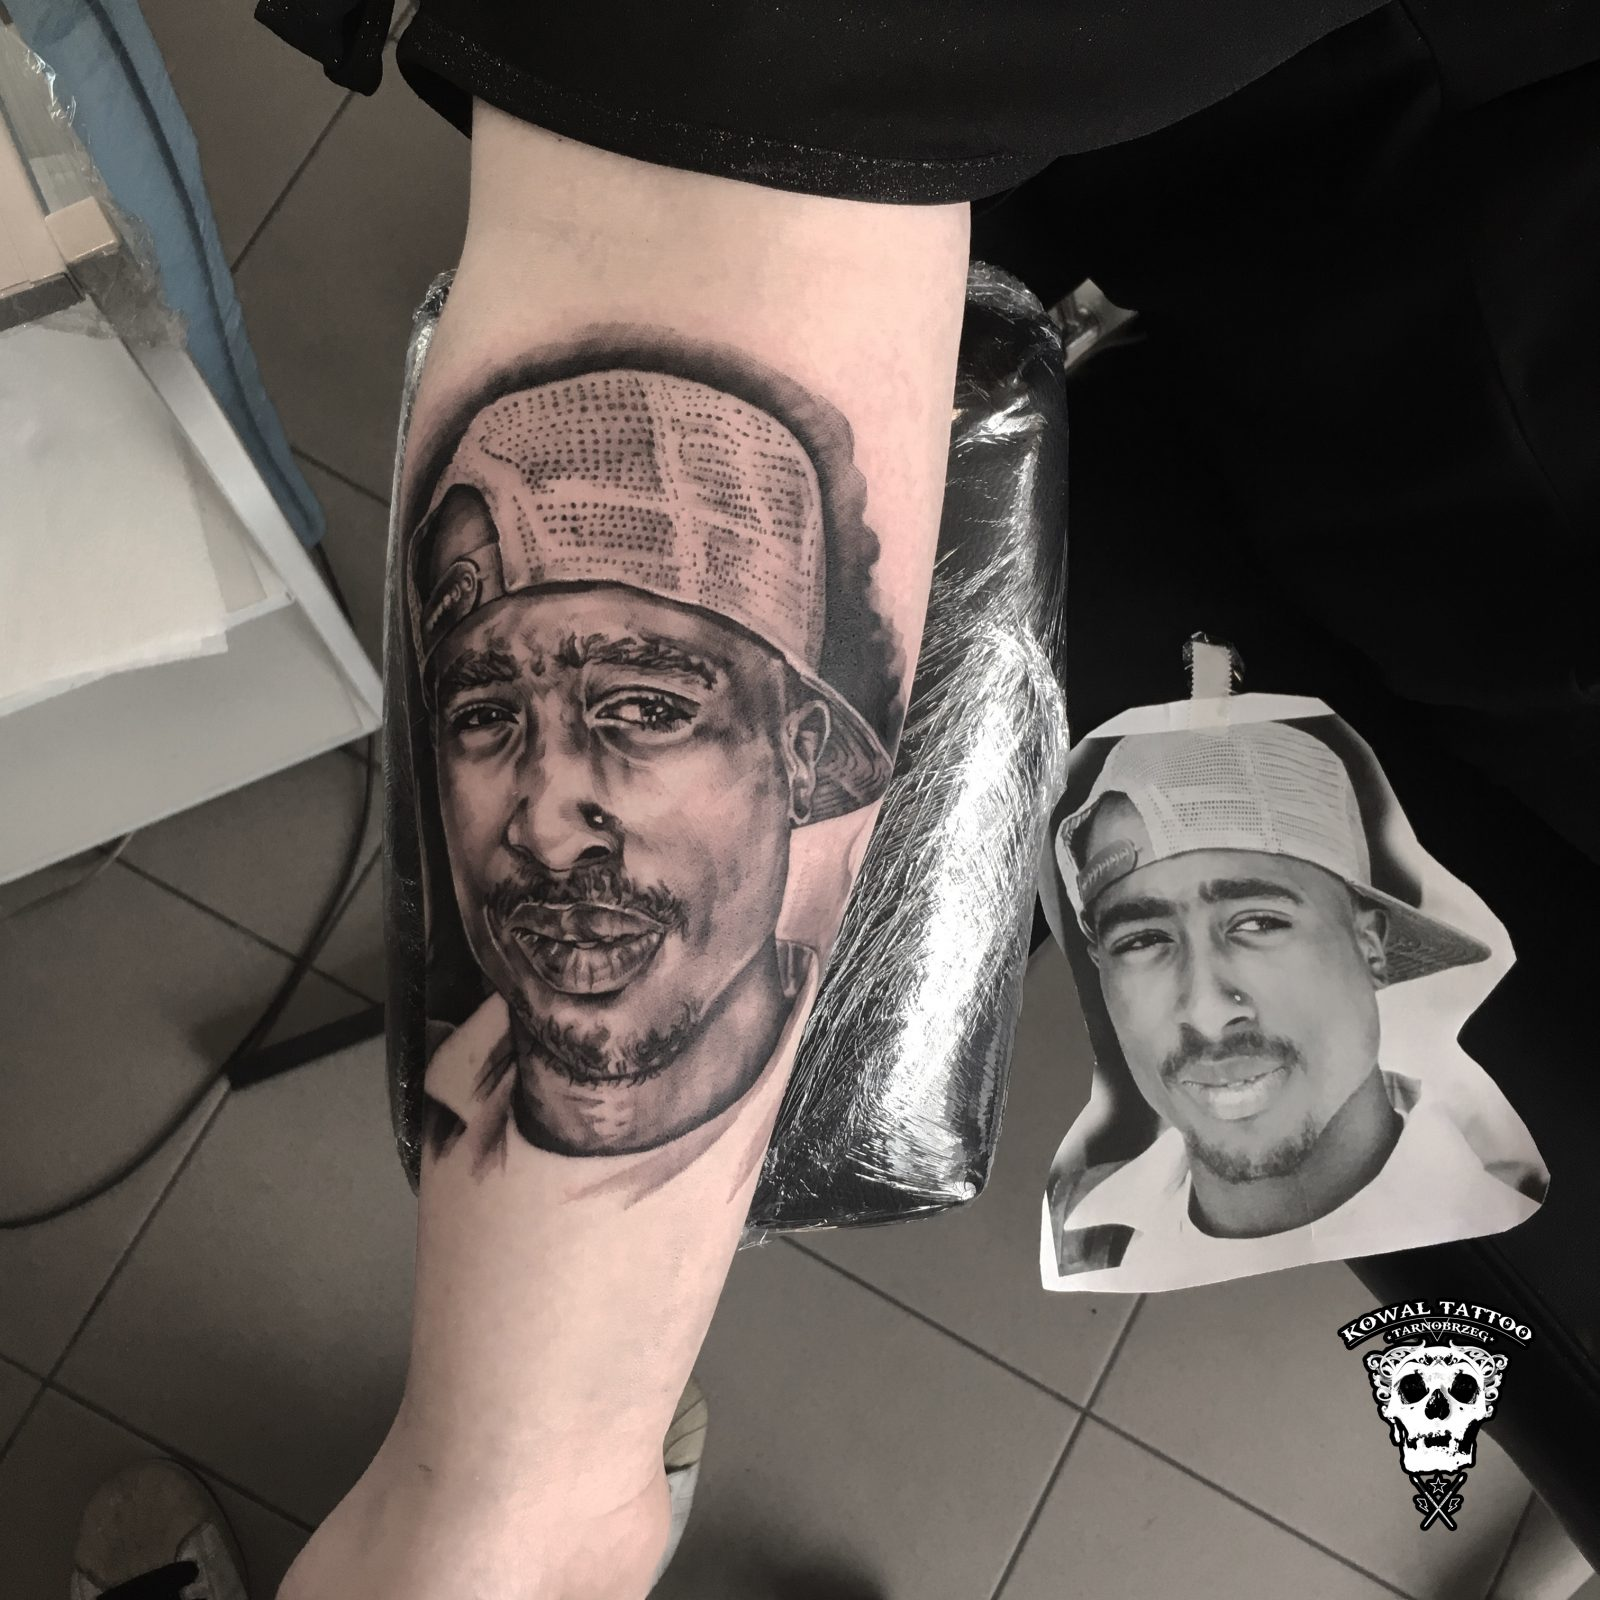 kowa-tattoo-2pac